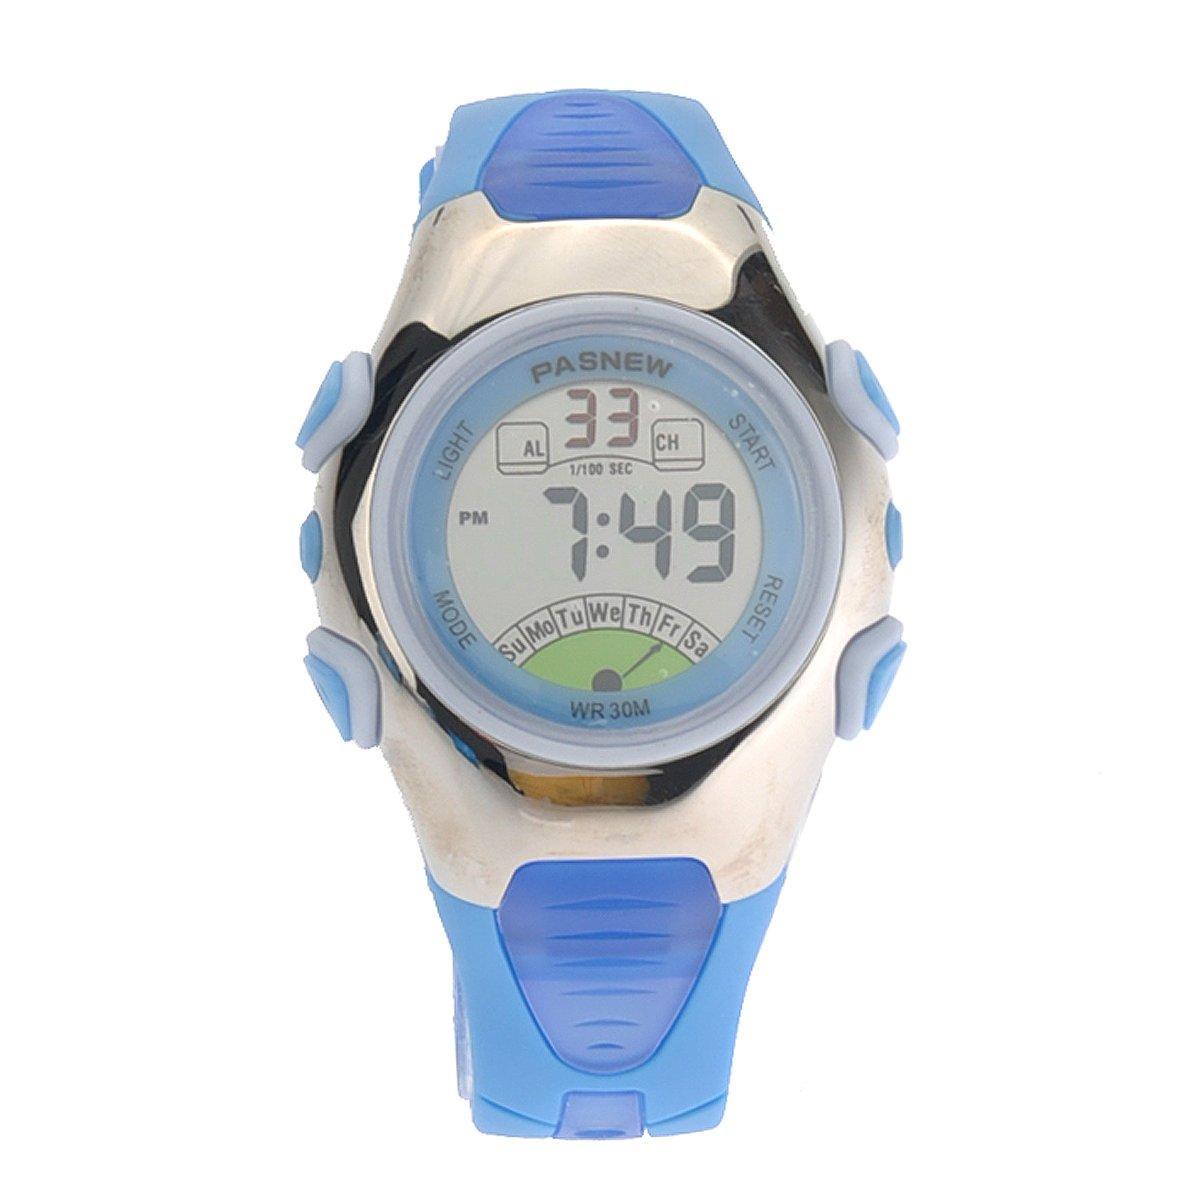 Foxnovo PASNEW Waterproof Children Boys Girls LED Digital Sports Watch (Blue)